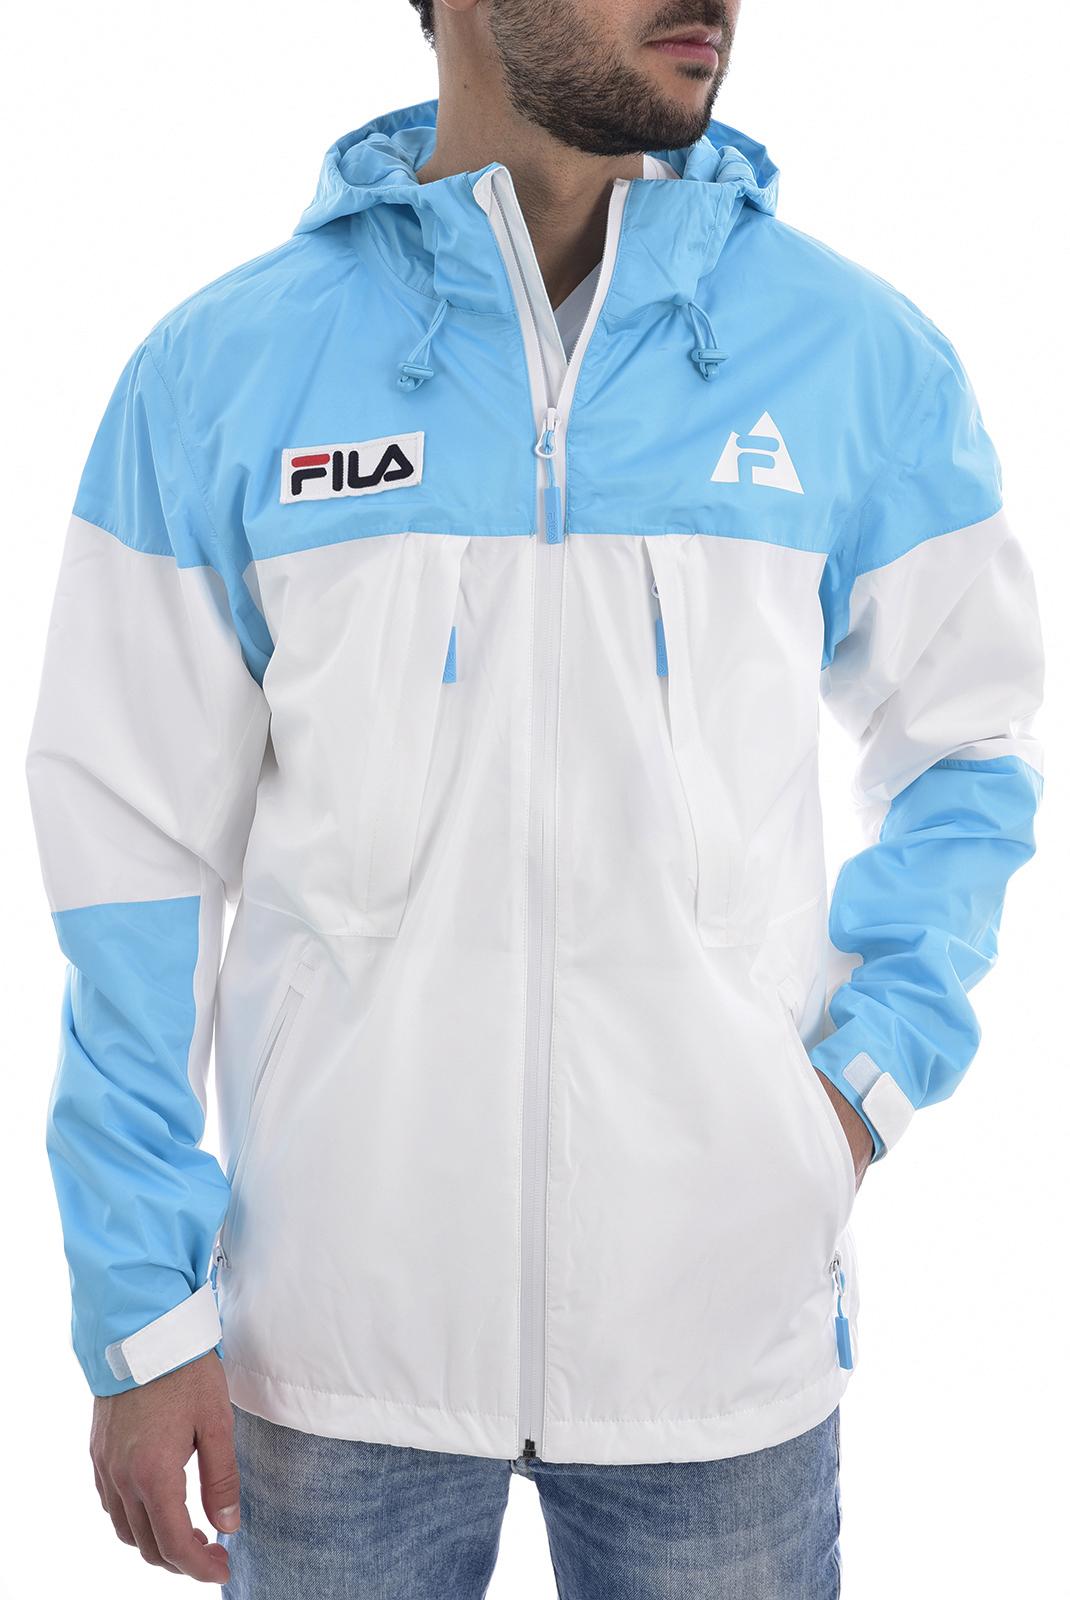 Blousons / doudounes  Fila 687122 HOLT SHELL A276 bright white-blue atoll